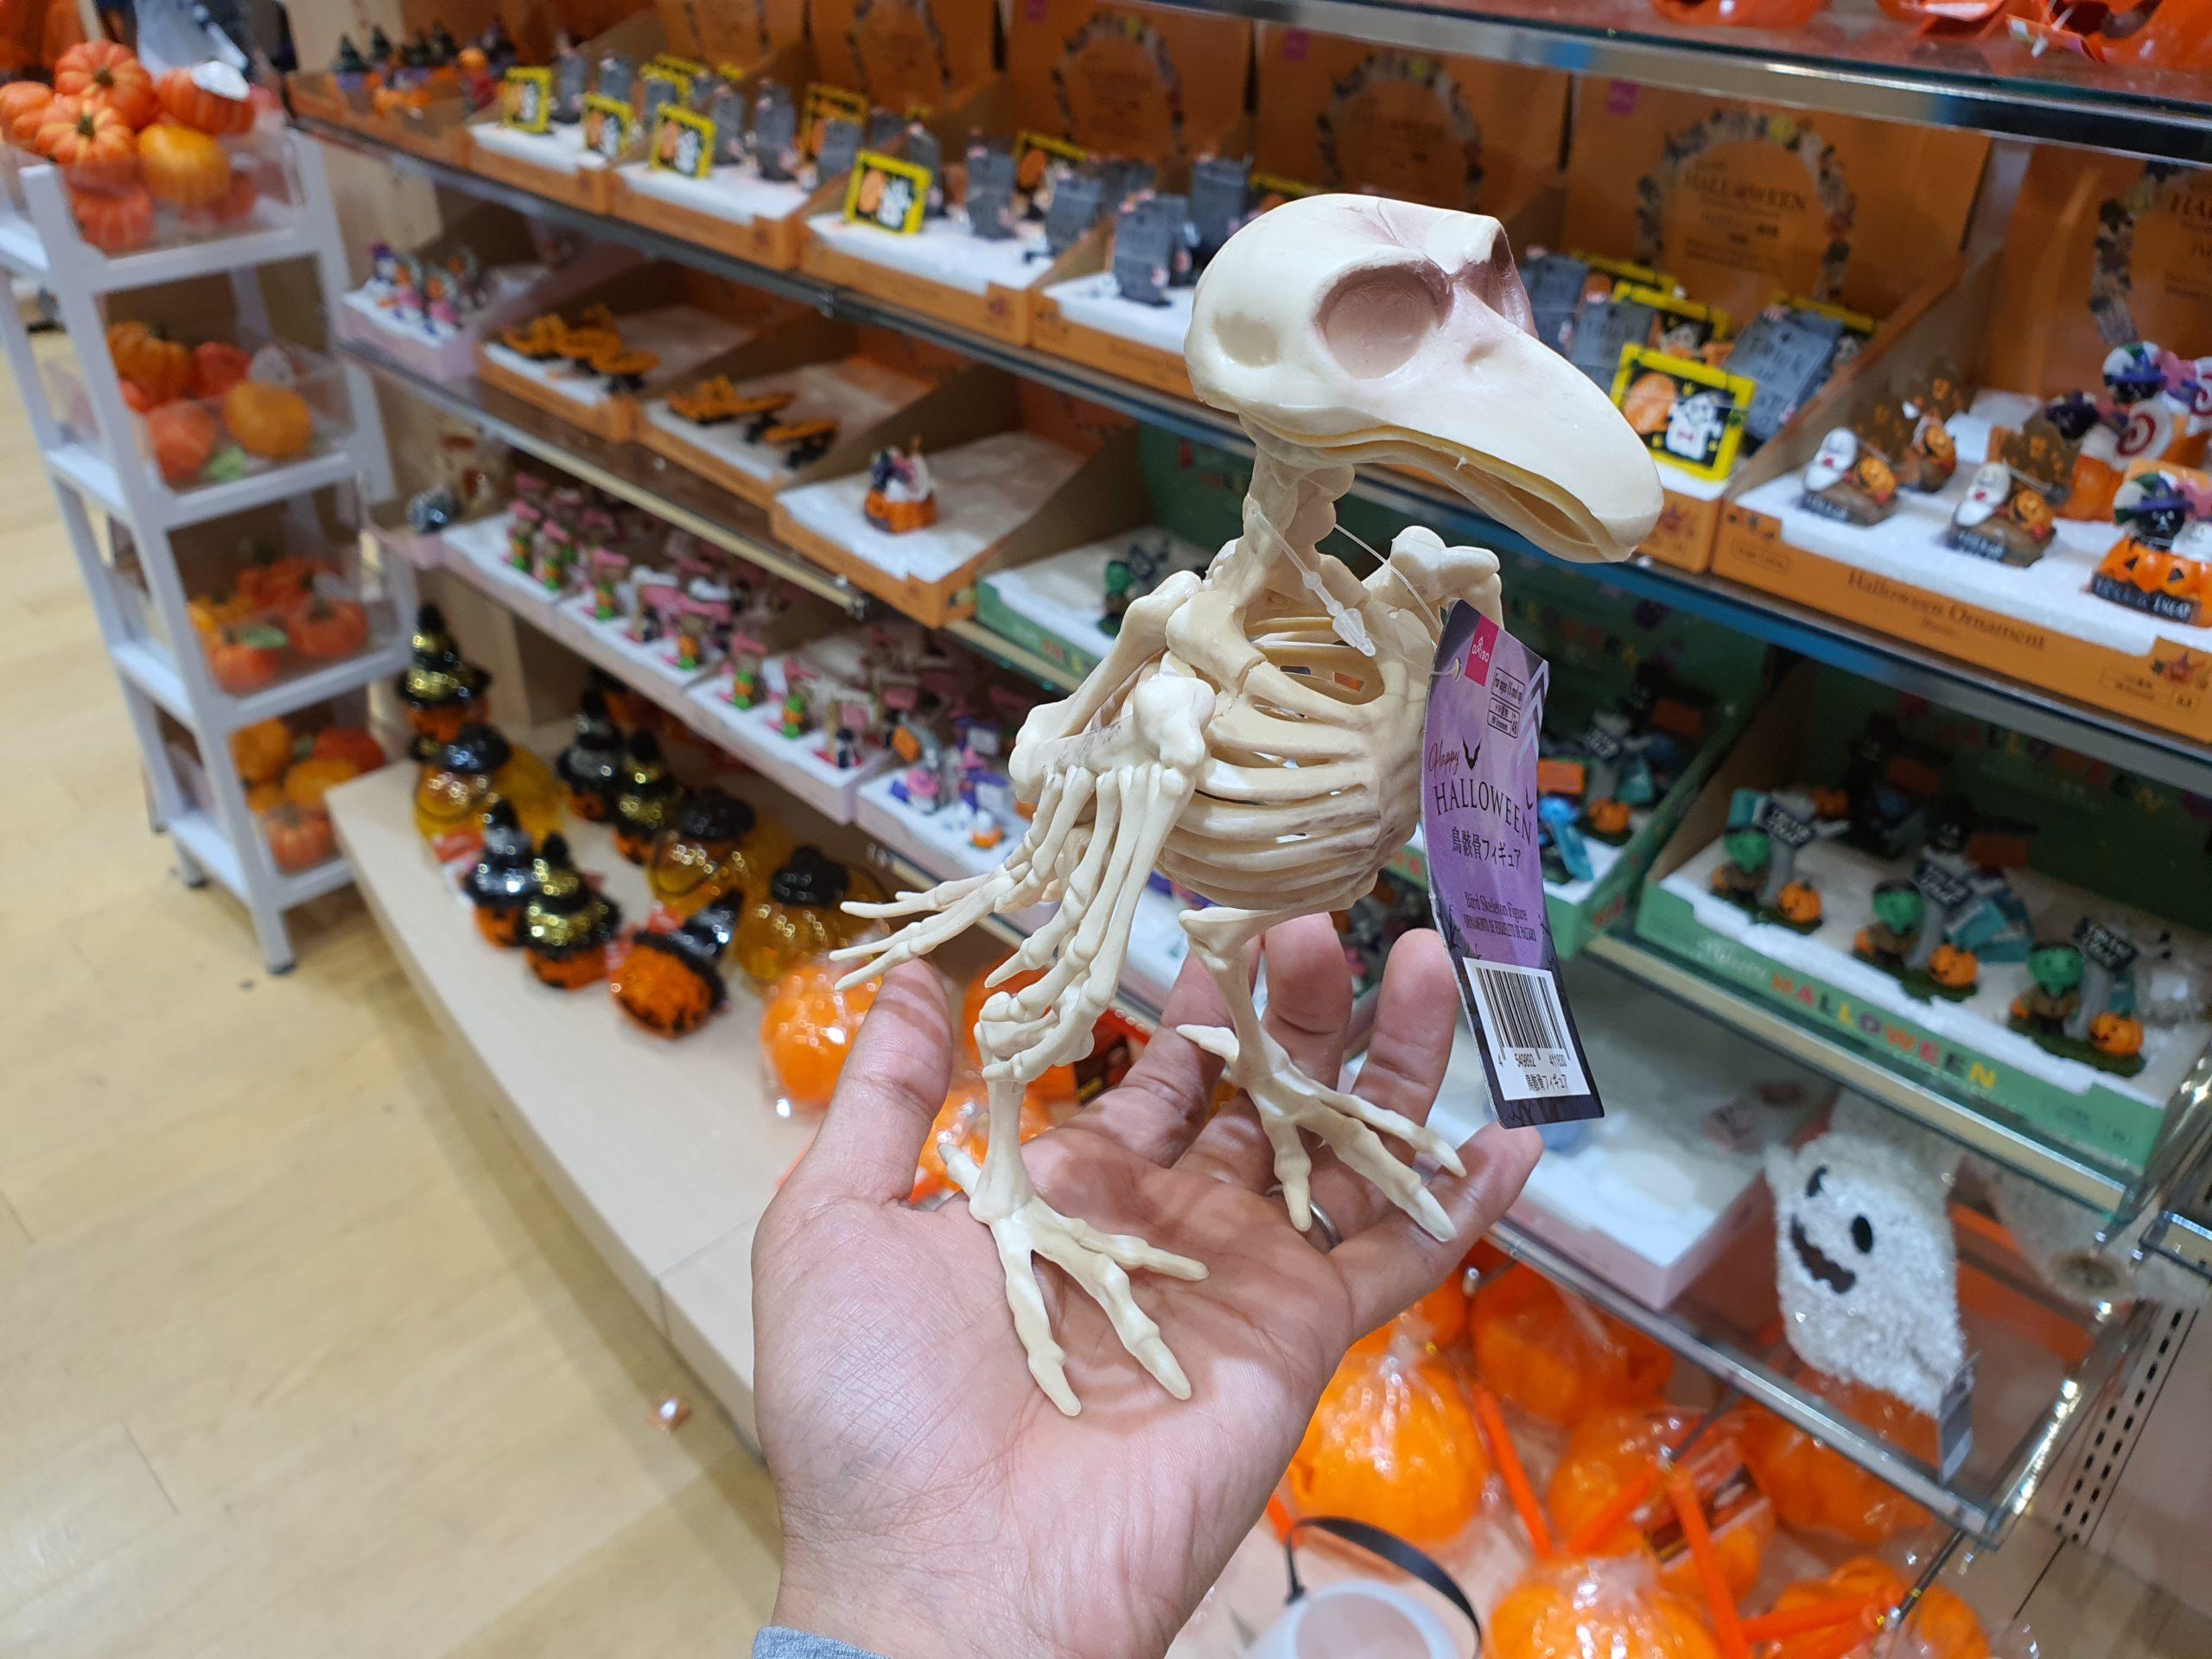 DAISOのハロウィンコーナーで見つけた鳥の骨格標本